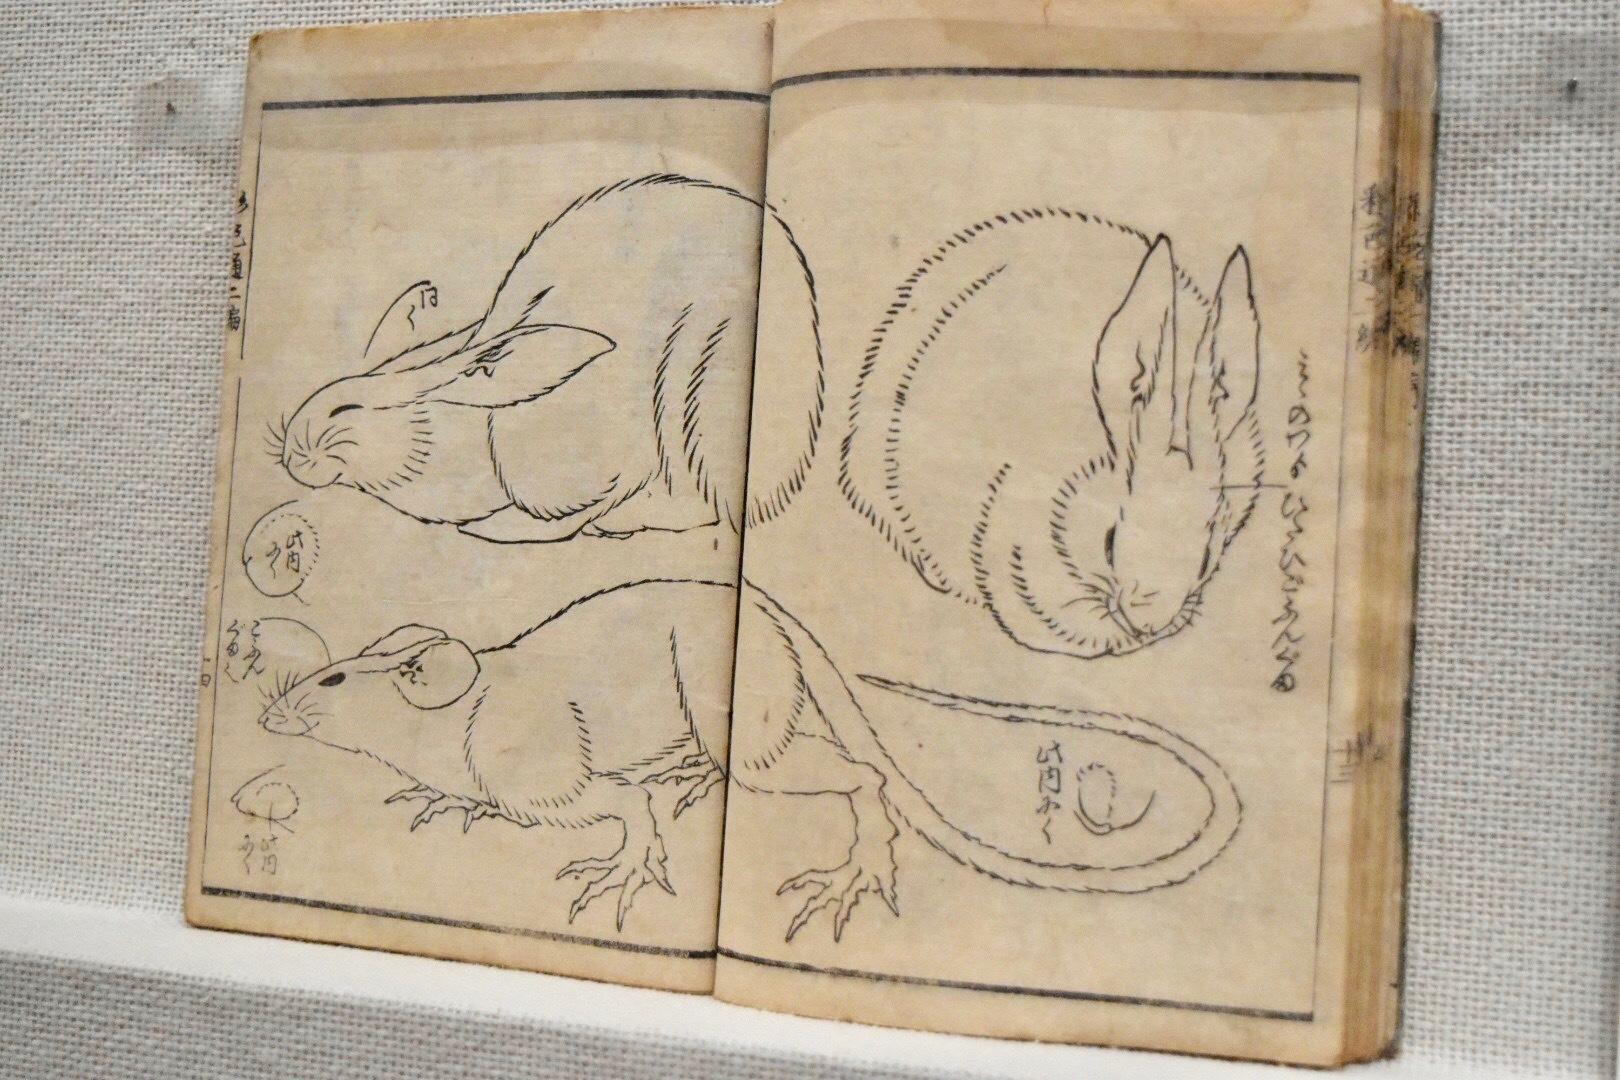 葛飾北斎 『画本彩色通』二編 弘化5年(1848)すみだ北斎美術館所蔵